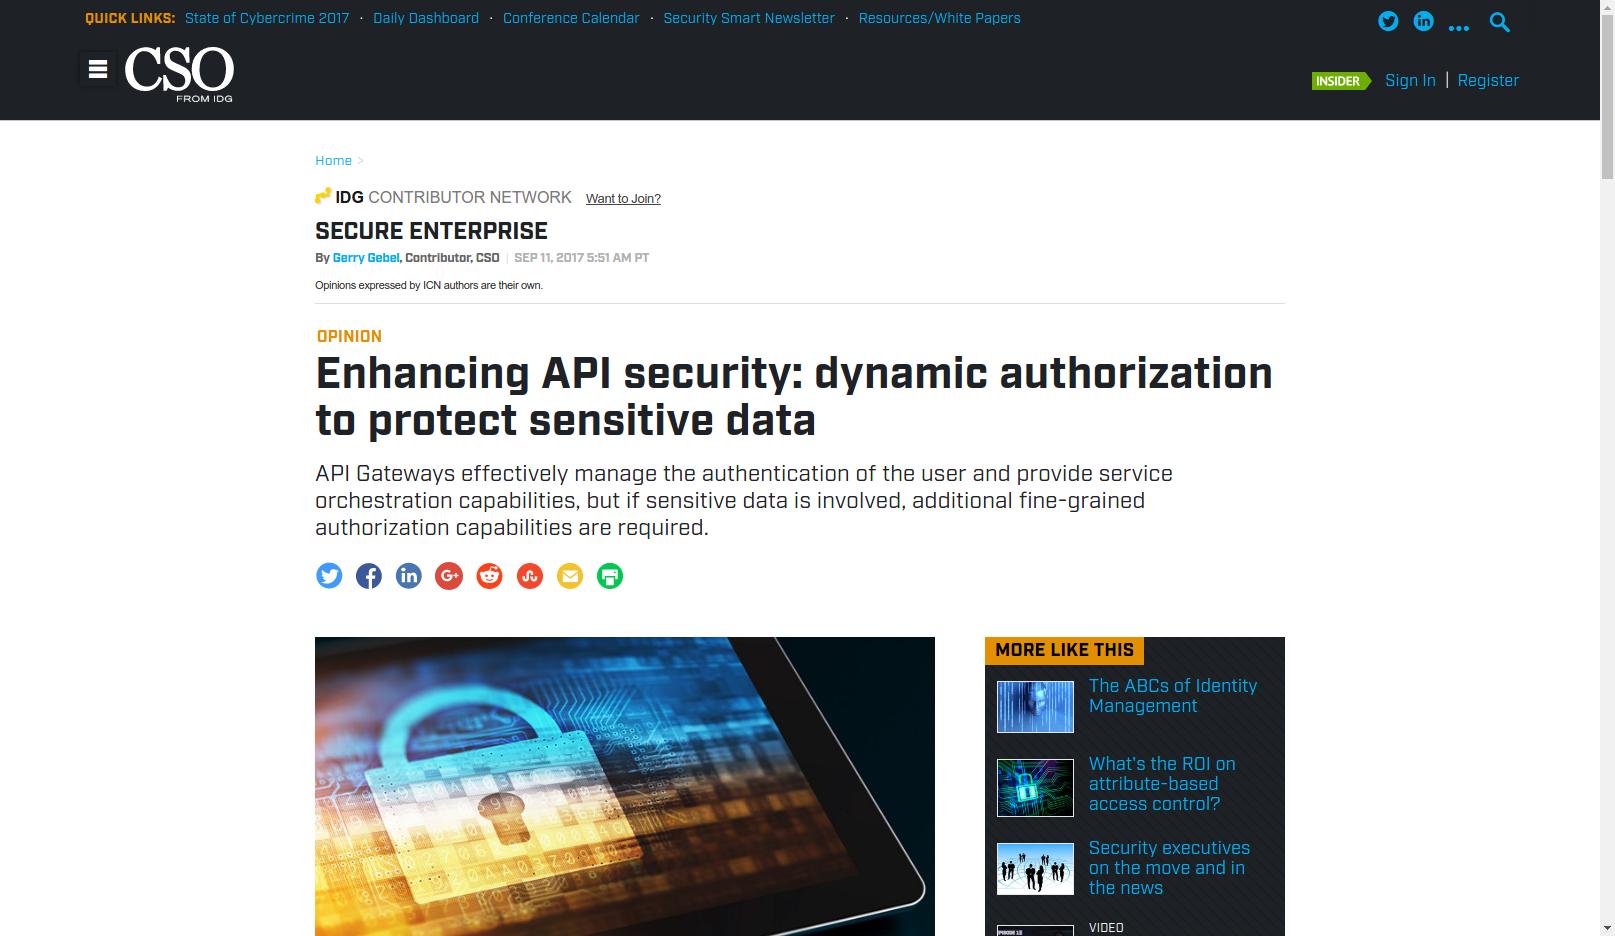 Enhancing API security: dynamic authorization to protect sensitive data